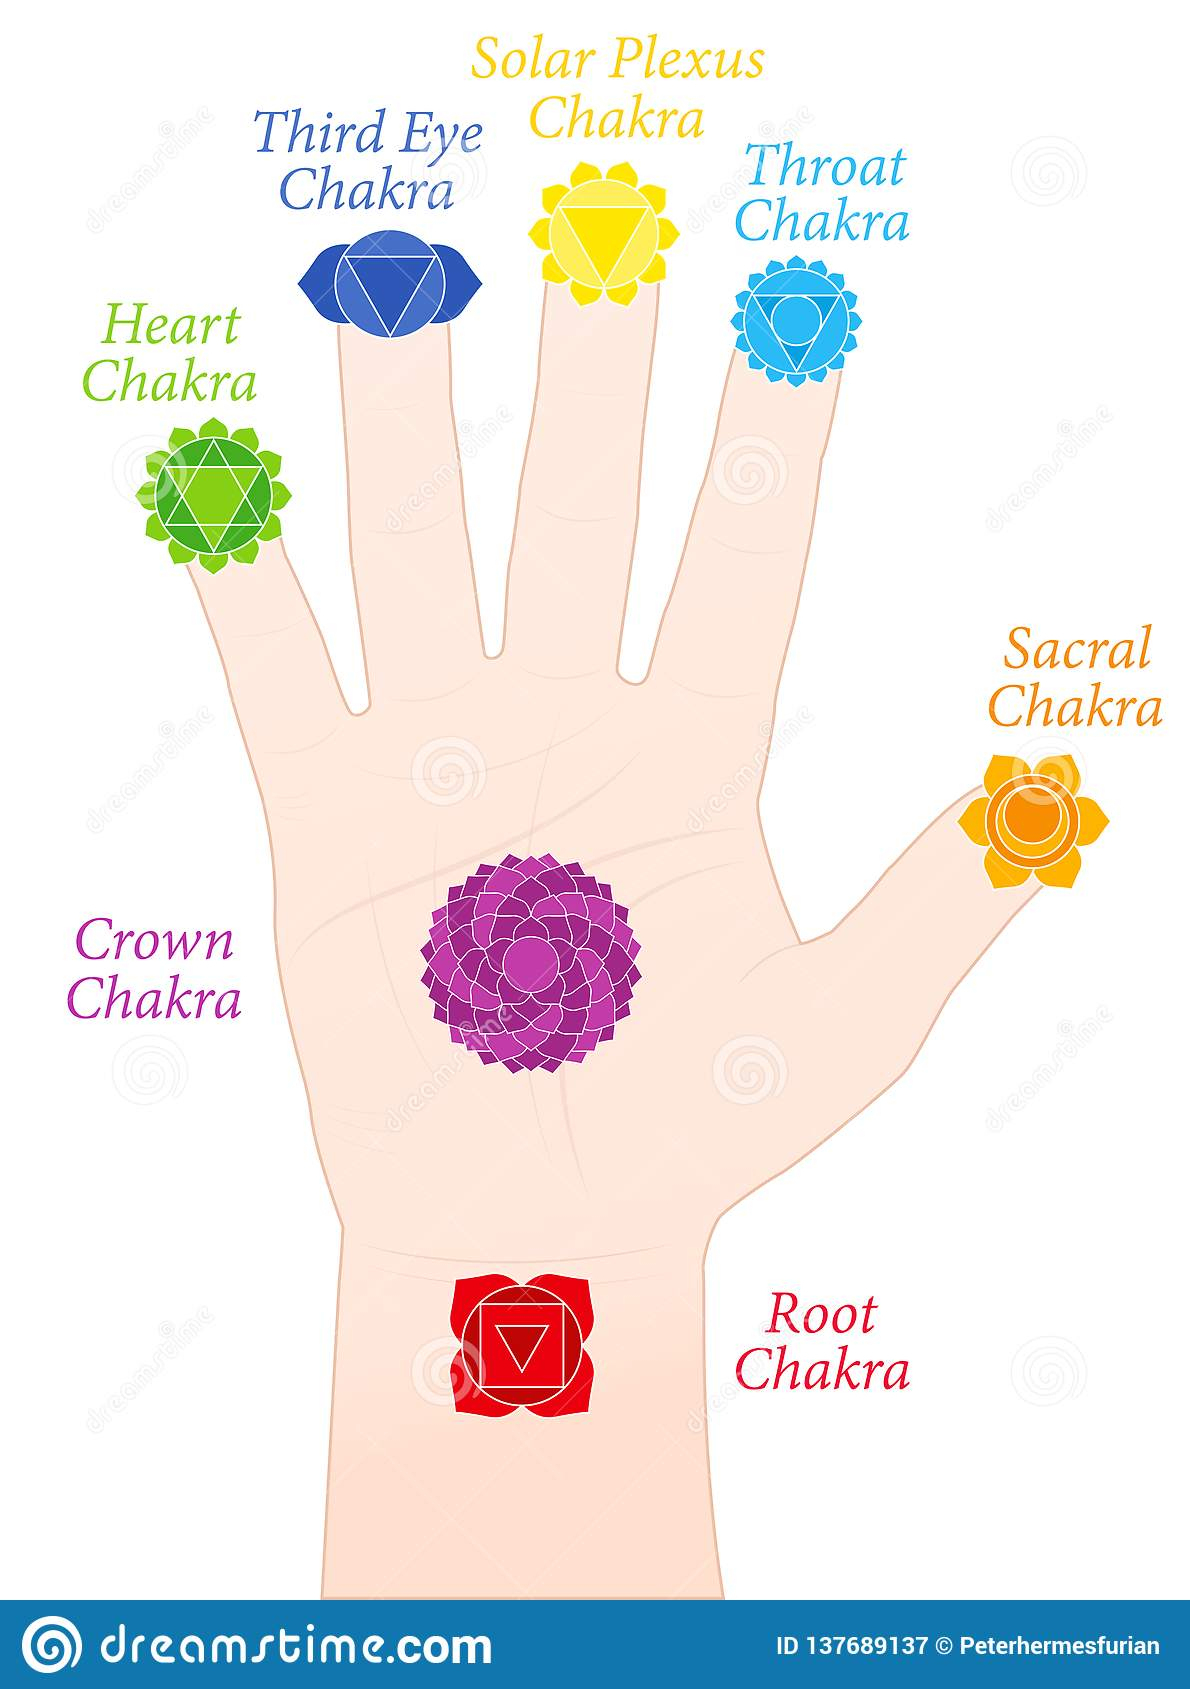 Noms De Symboles De Doigts De Main De Chakras De Paume avec Le Nom Des Doigts De La Main